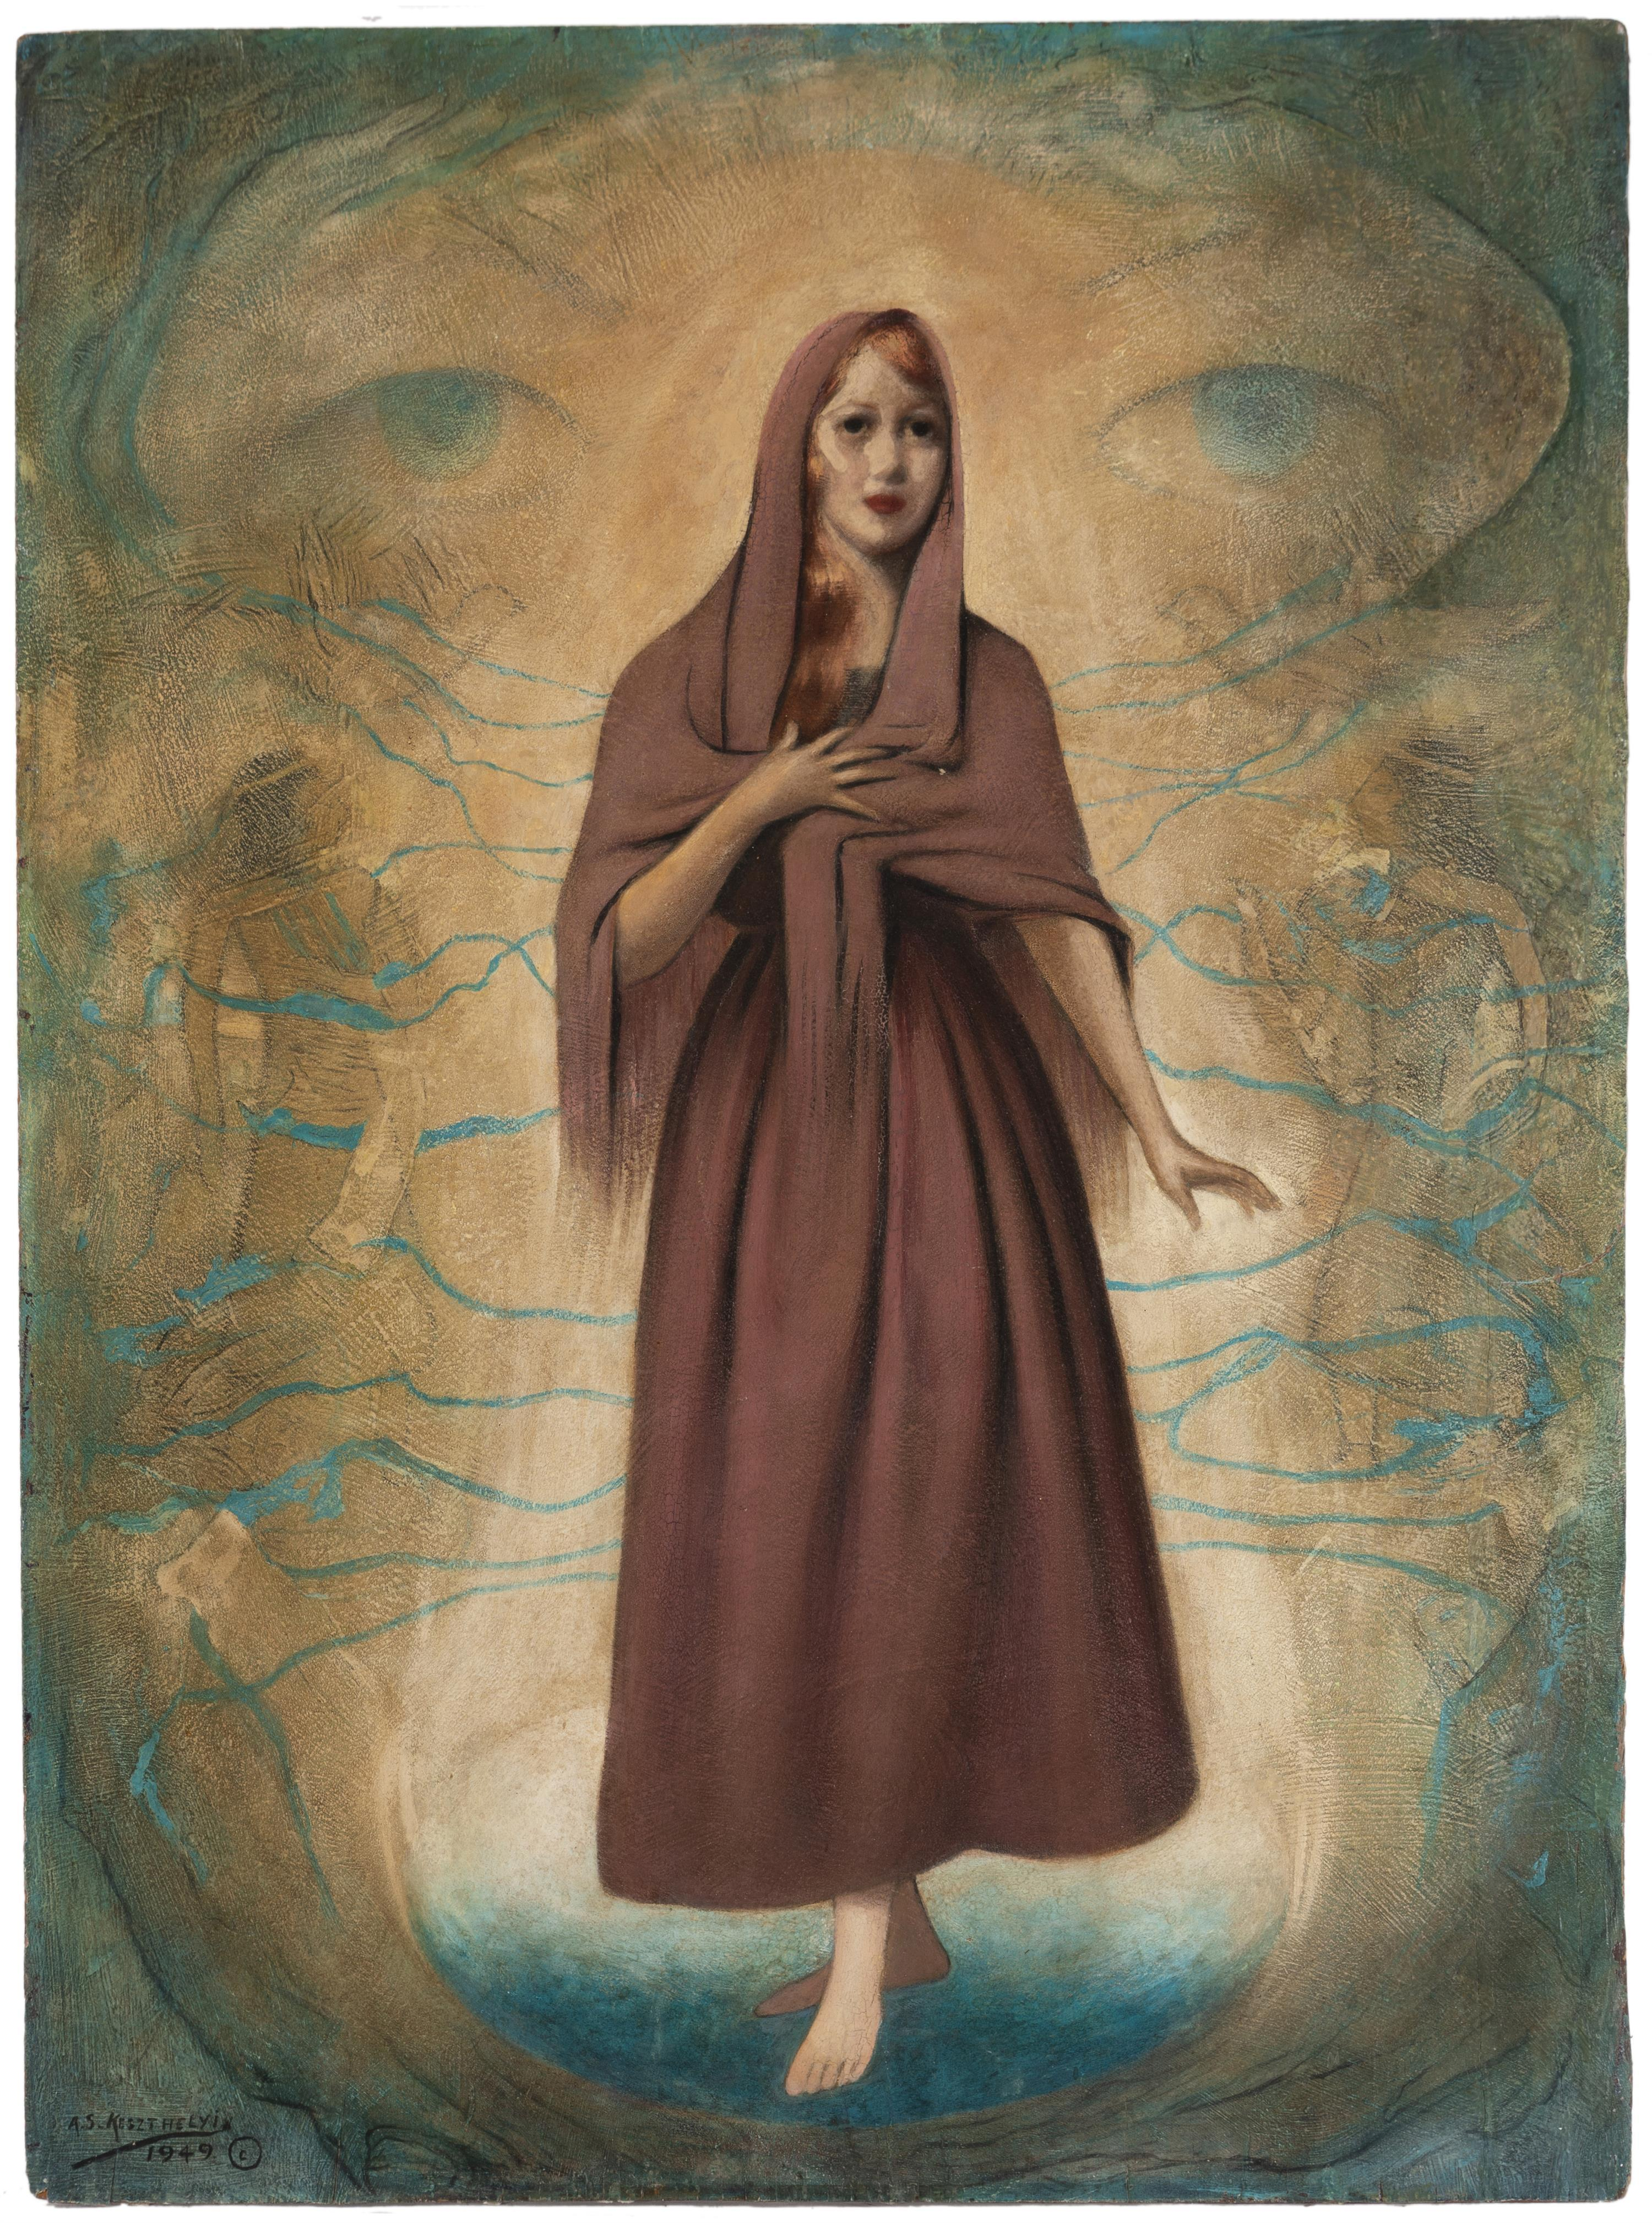 "Alexander Samuel Keszthelyi, (1874-1953 San Bernardino, CA), Woman in a surrealist composition, 1949, Oil on panel, 30"" H x 22"" W"